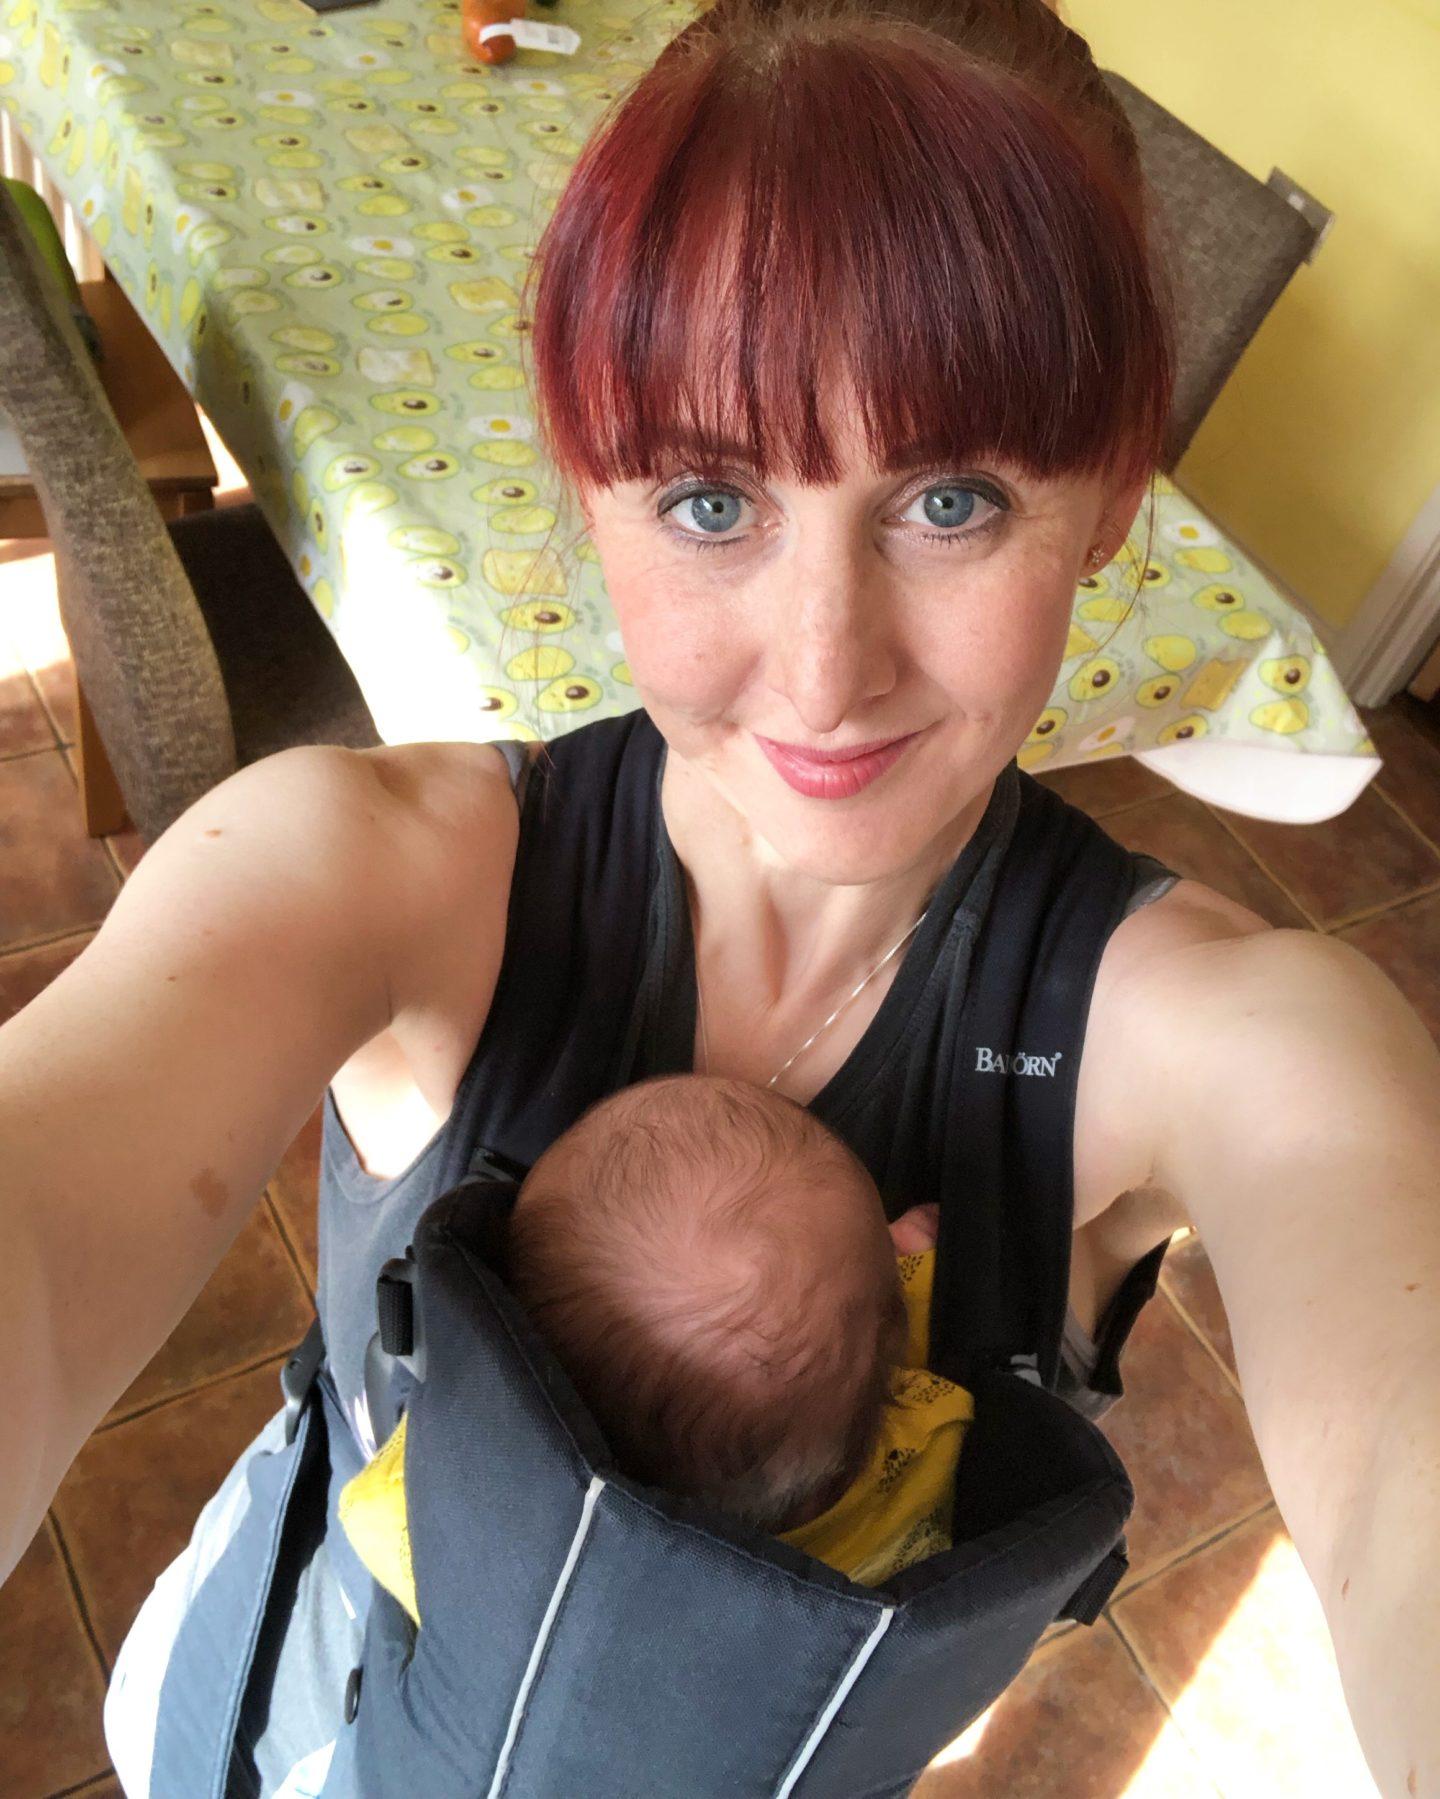 secrets about newborn babies - baby wearing mum